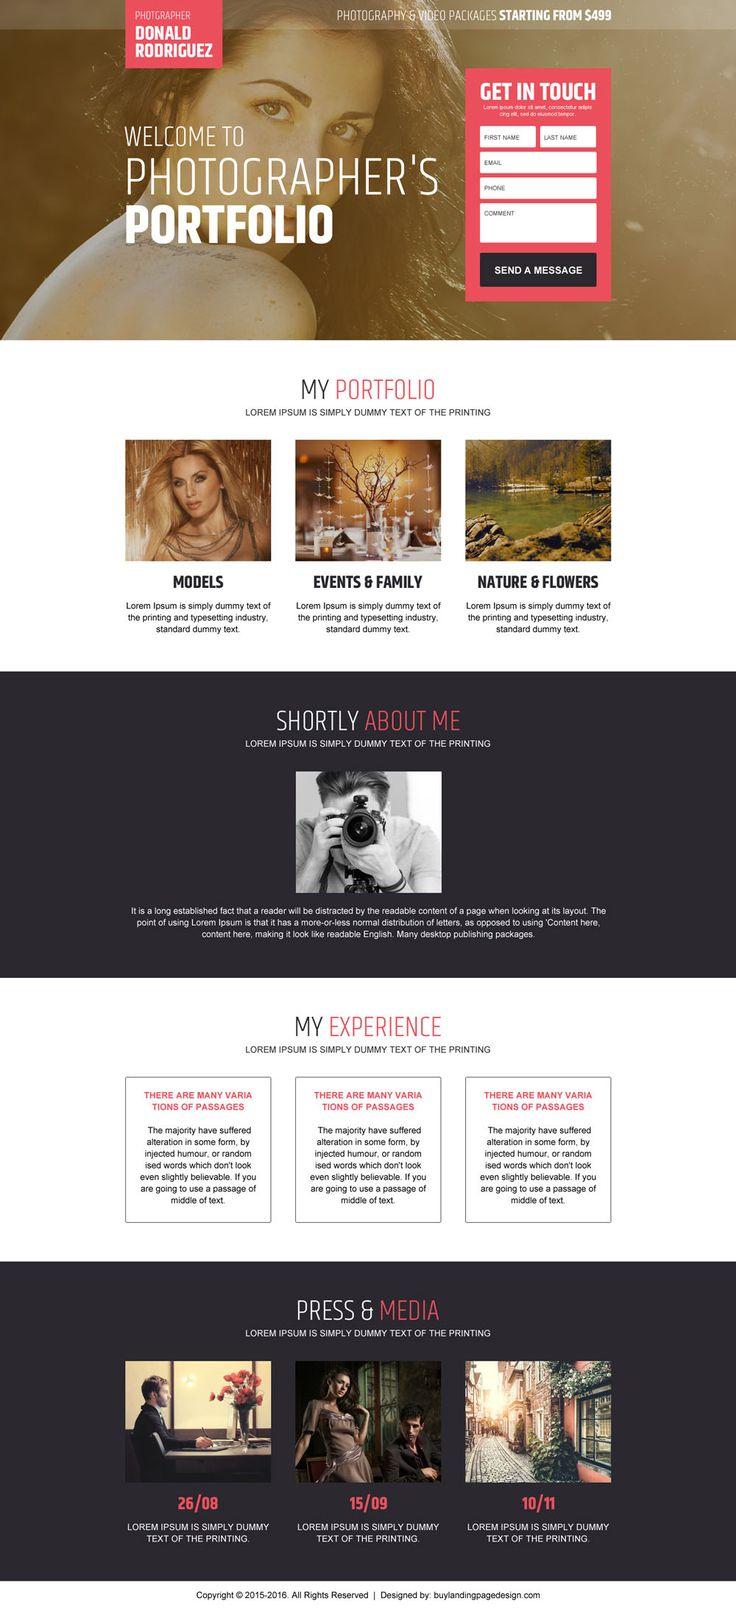 photographers portfolio converting landing page design https://www.buylandingpagedesign.com/buy/photographers-portfolio-converting-landing-page-design/1900